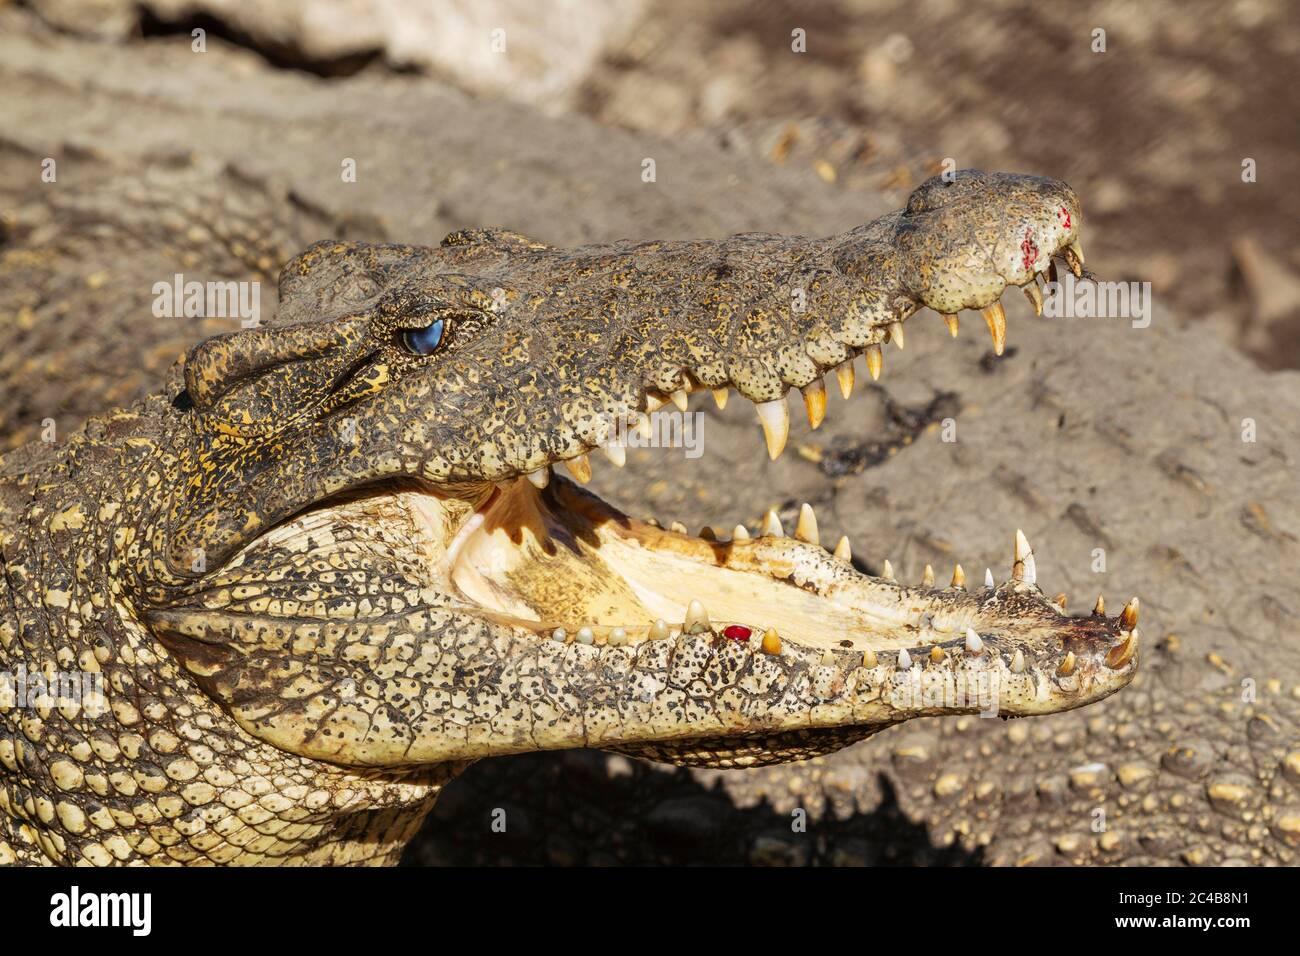 Cuban crocodile (Crocodylus rhombifer), critically endangered, captive at a crocodile-breeding farm, Zapata Peninsula, Cuba Stock Photo